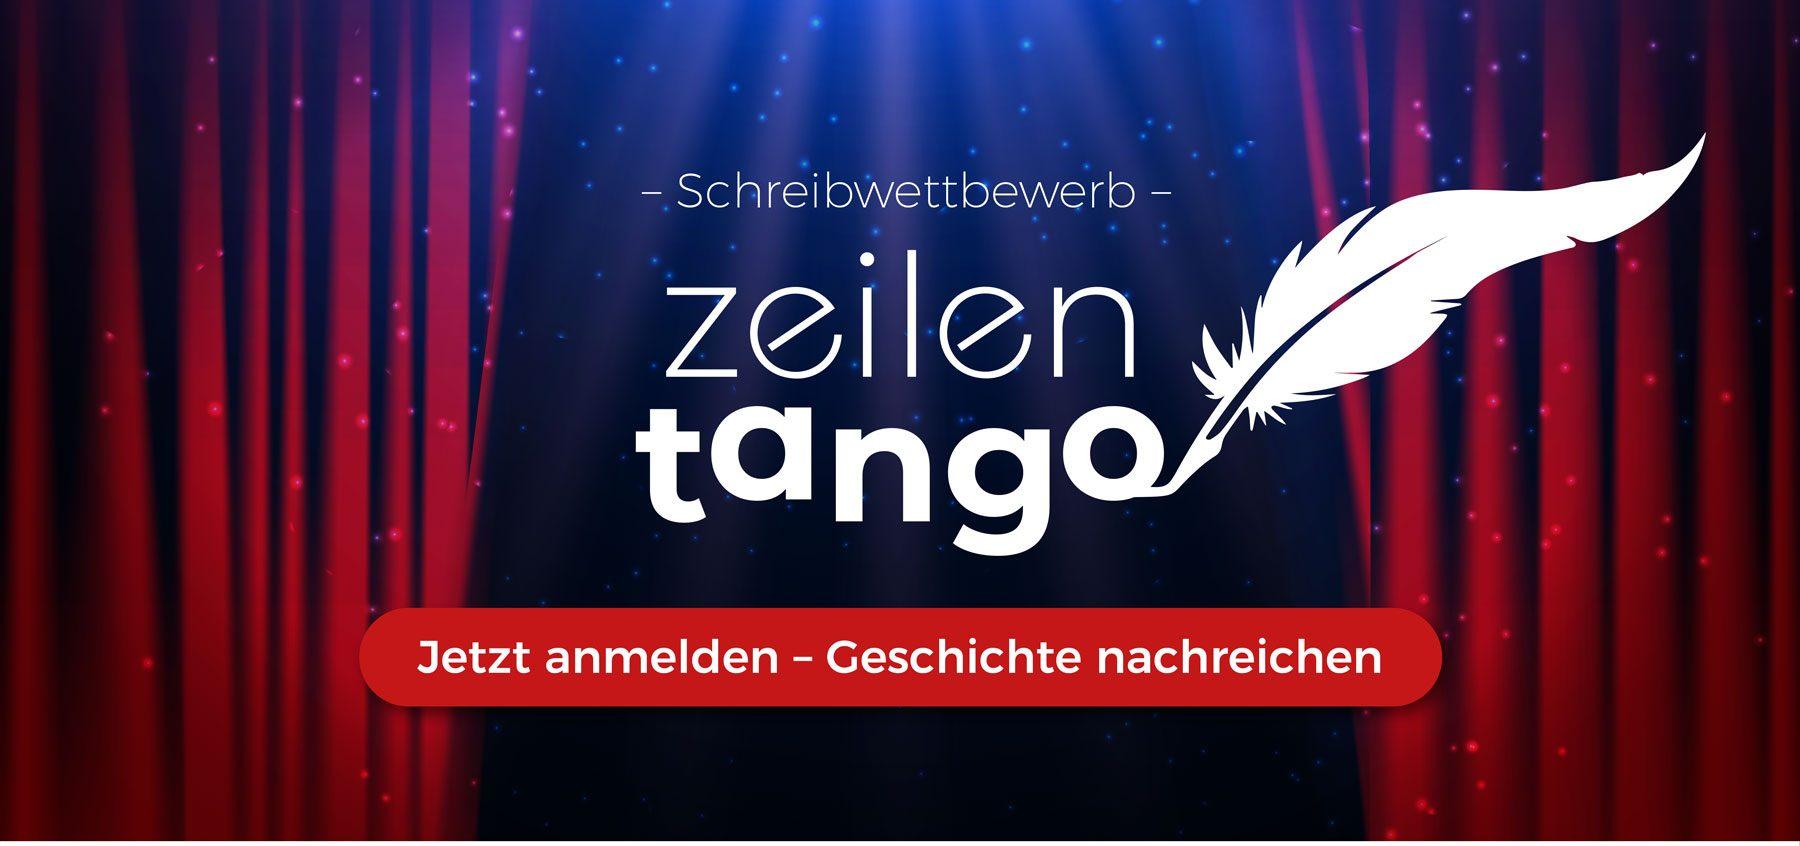 Zeilentango_Teaser_1800x960-ohne